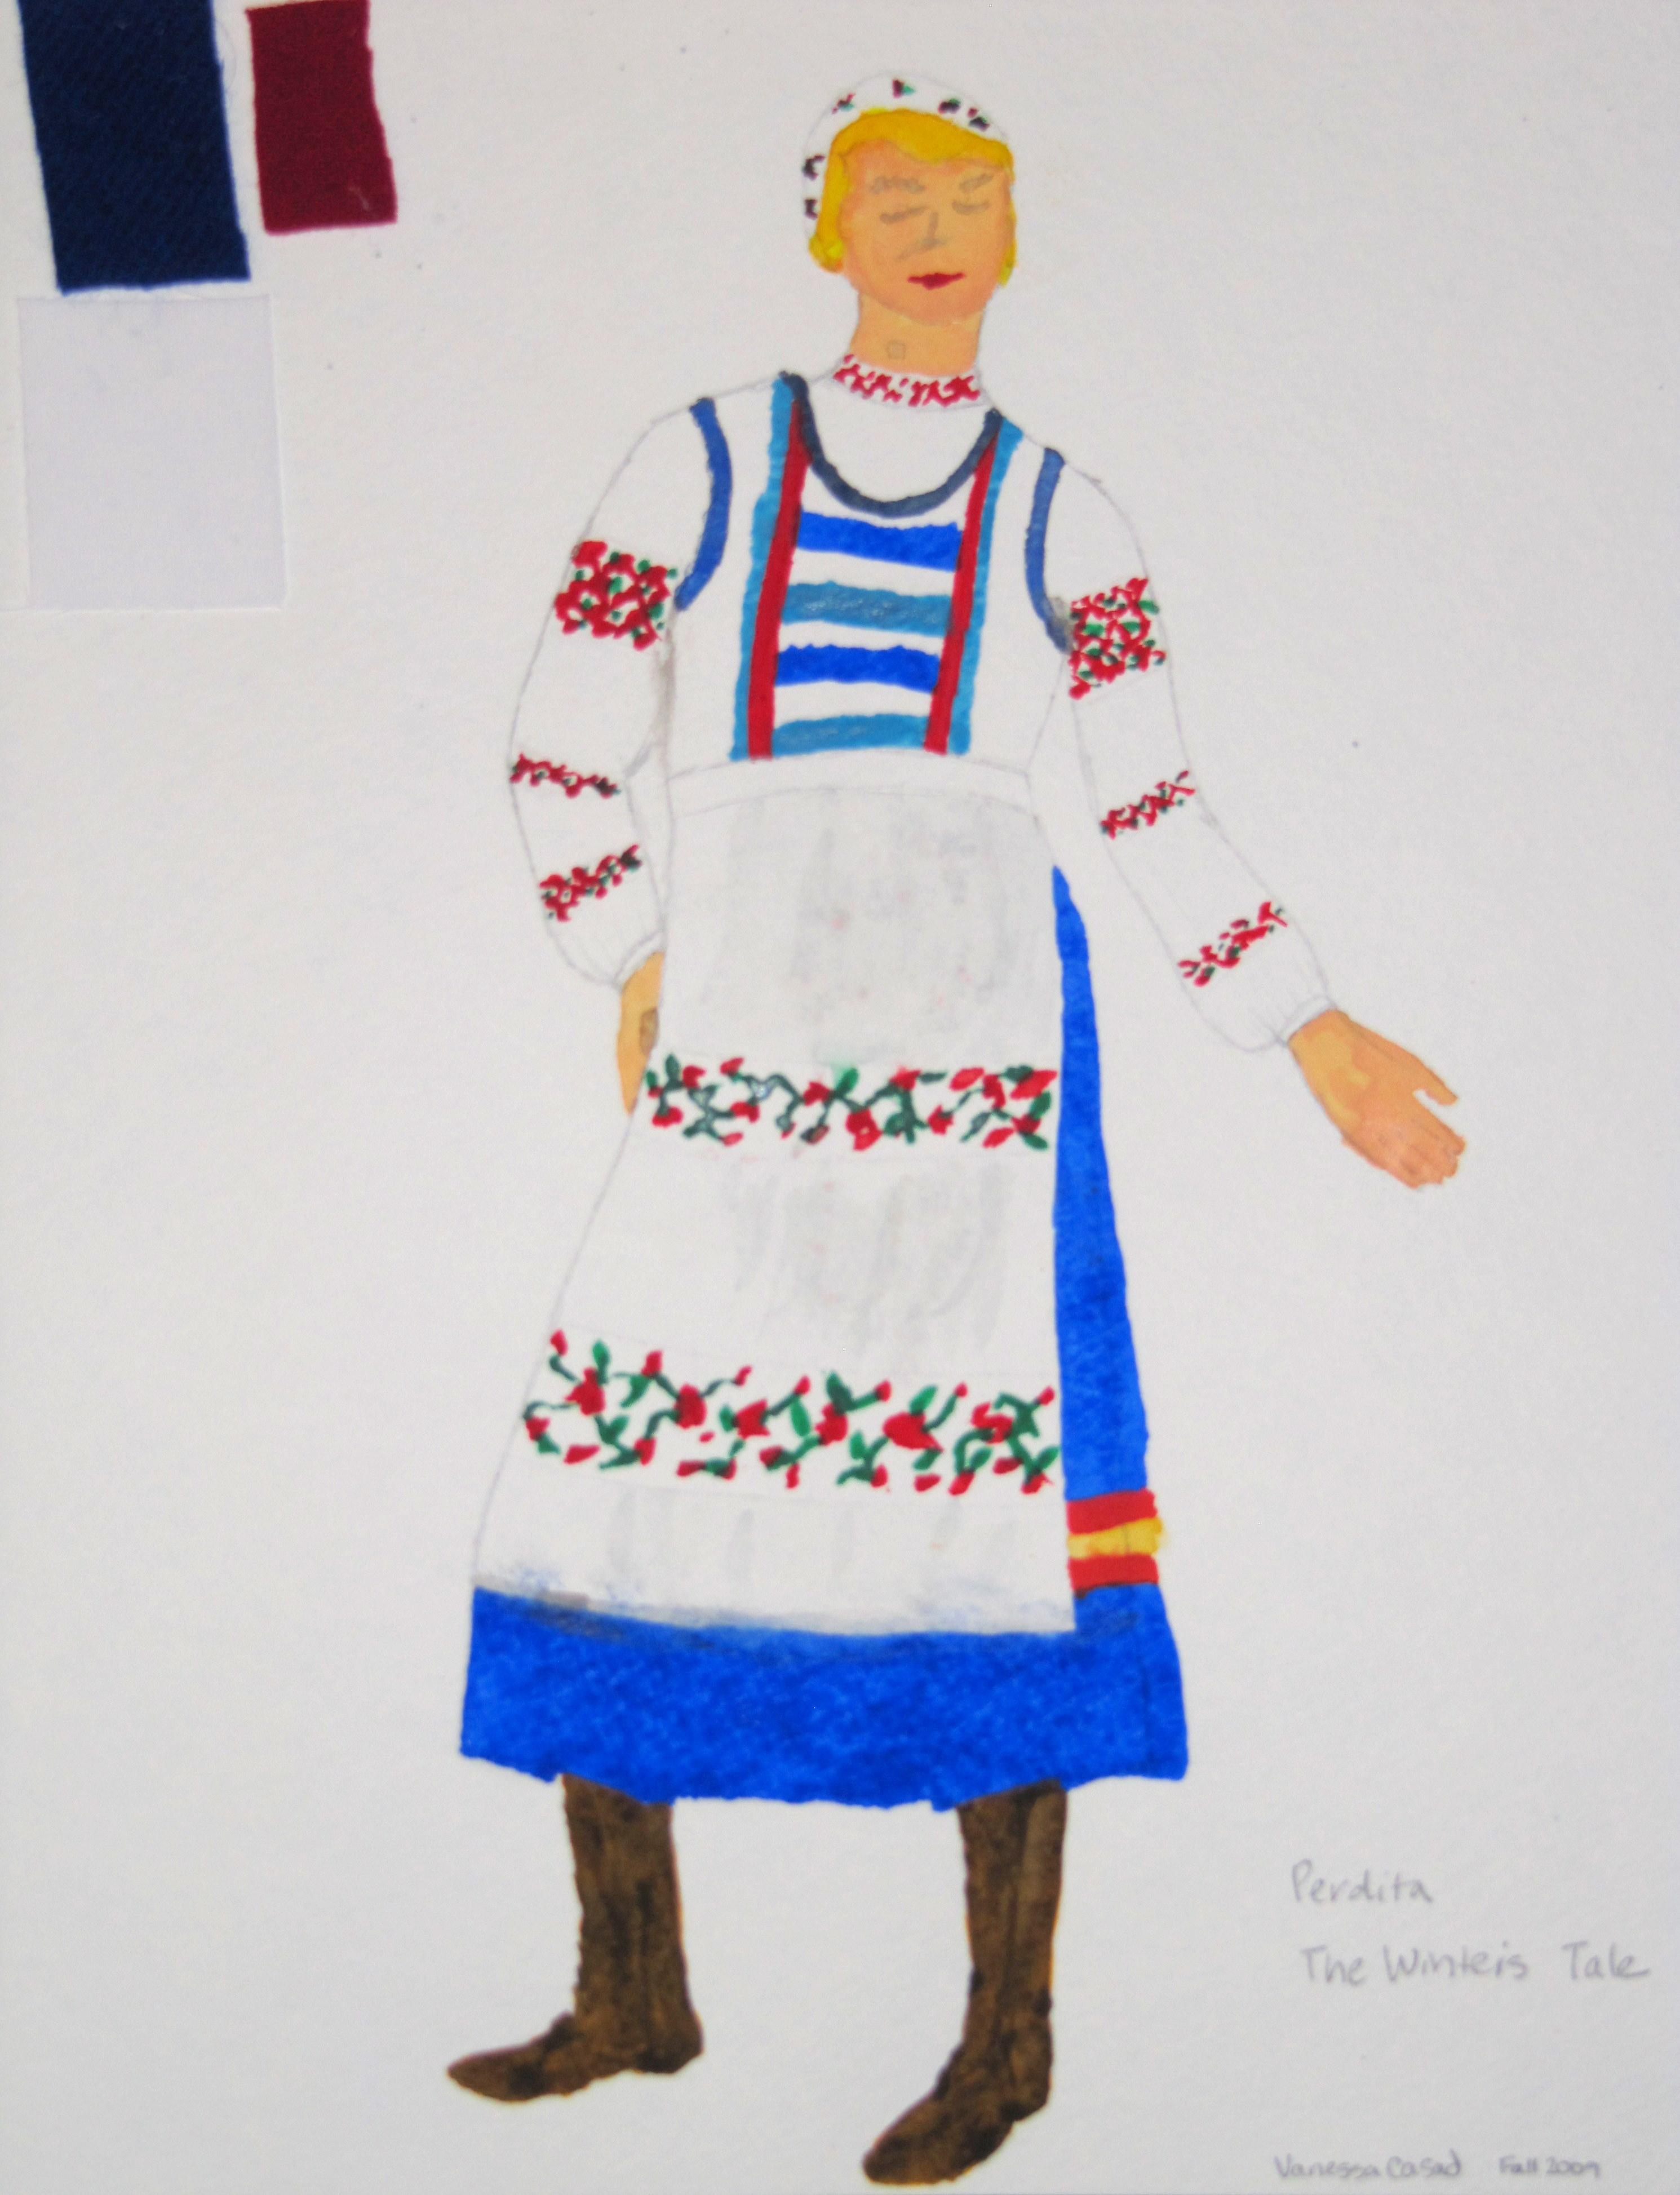 Image search: Nn Models Ukraine